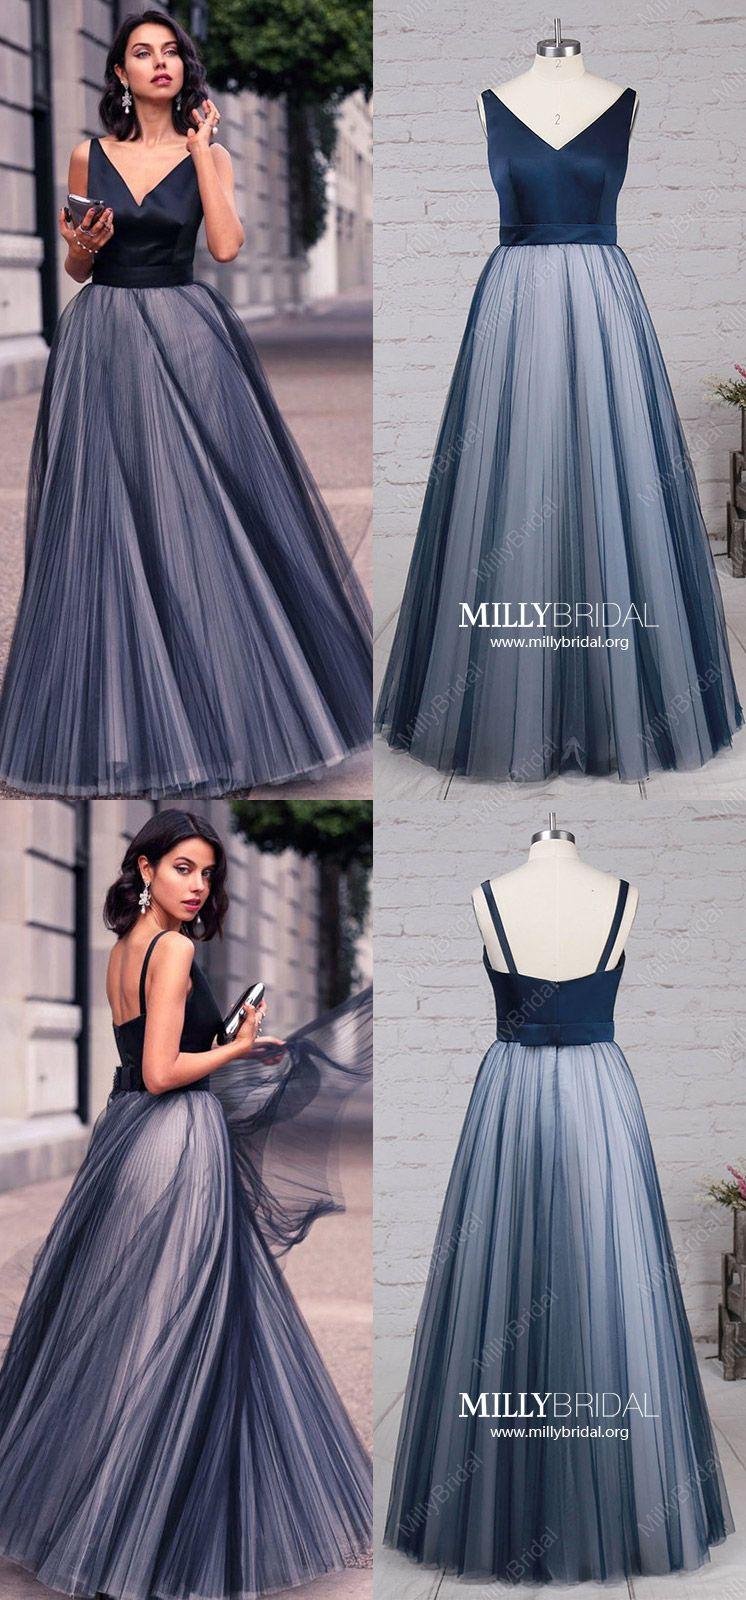 Long prom dressesvintage prom dressesprincess prom dresses for